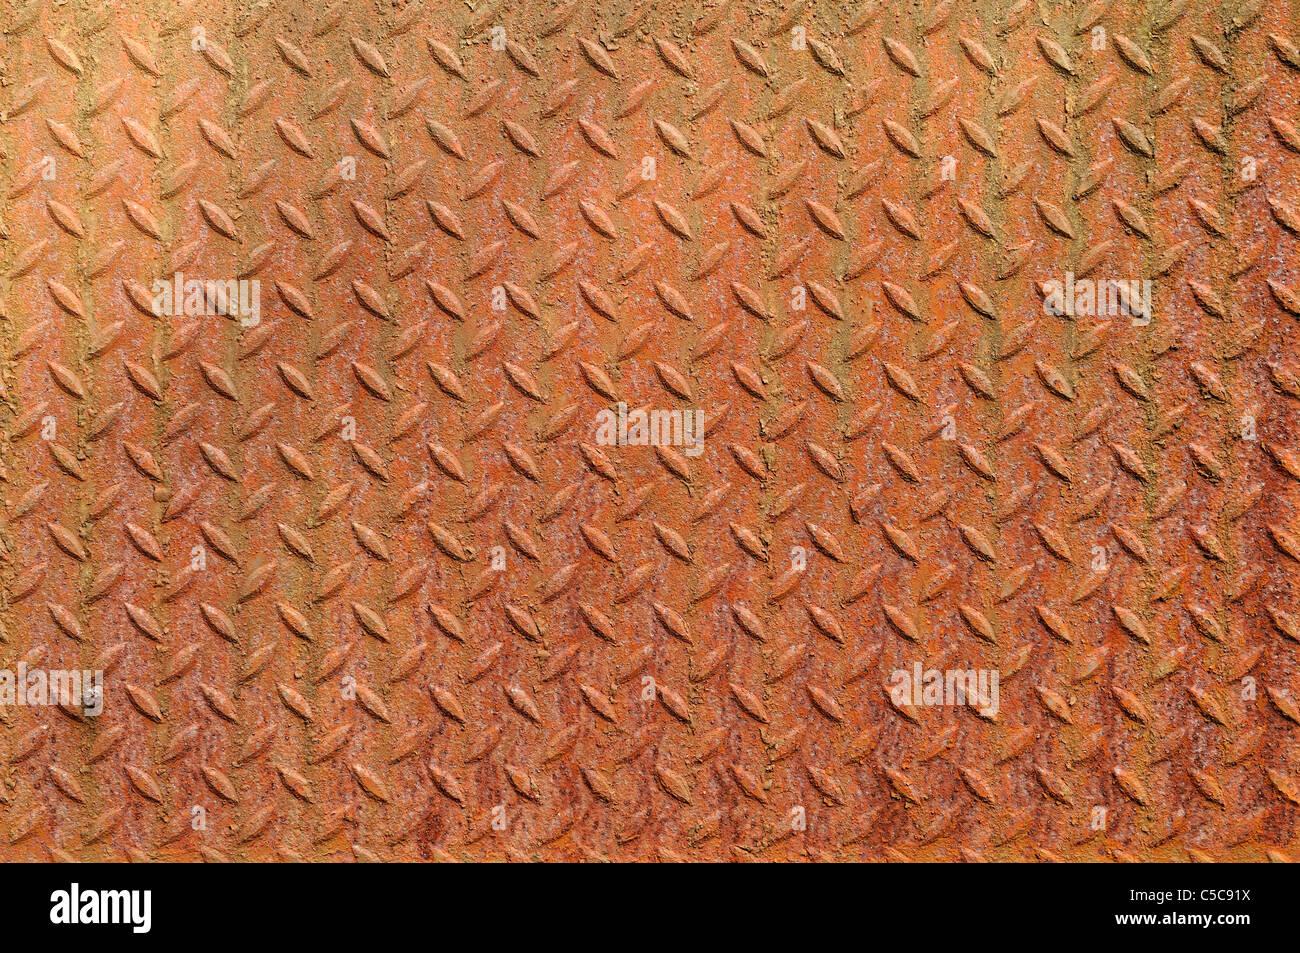 D'une texture grunge metal diamond plate. Photo Stock